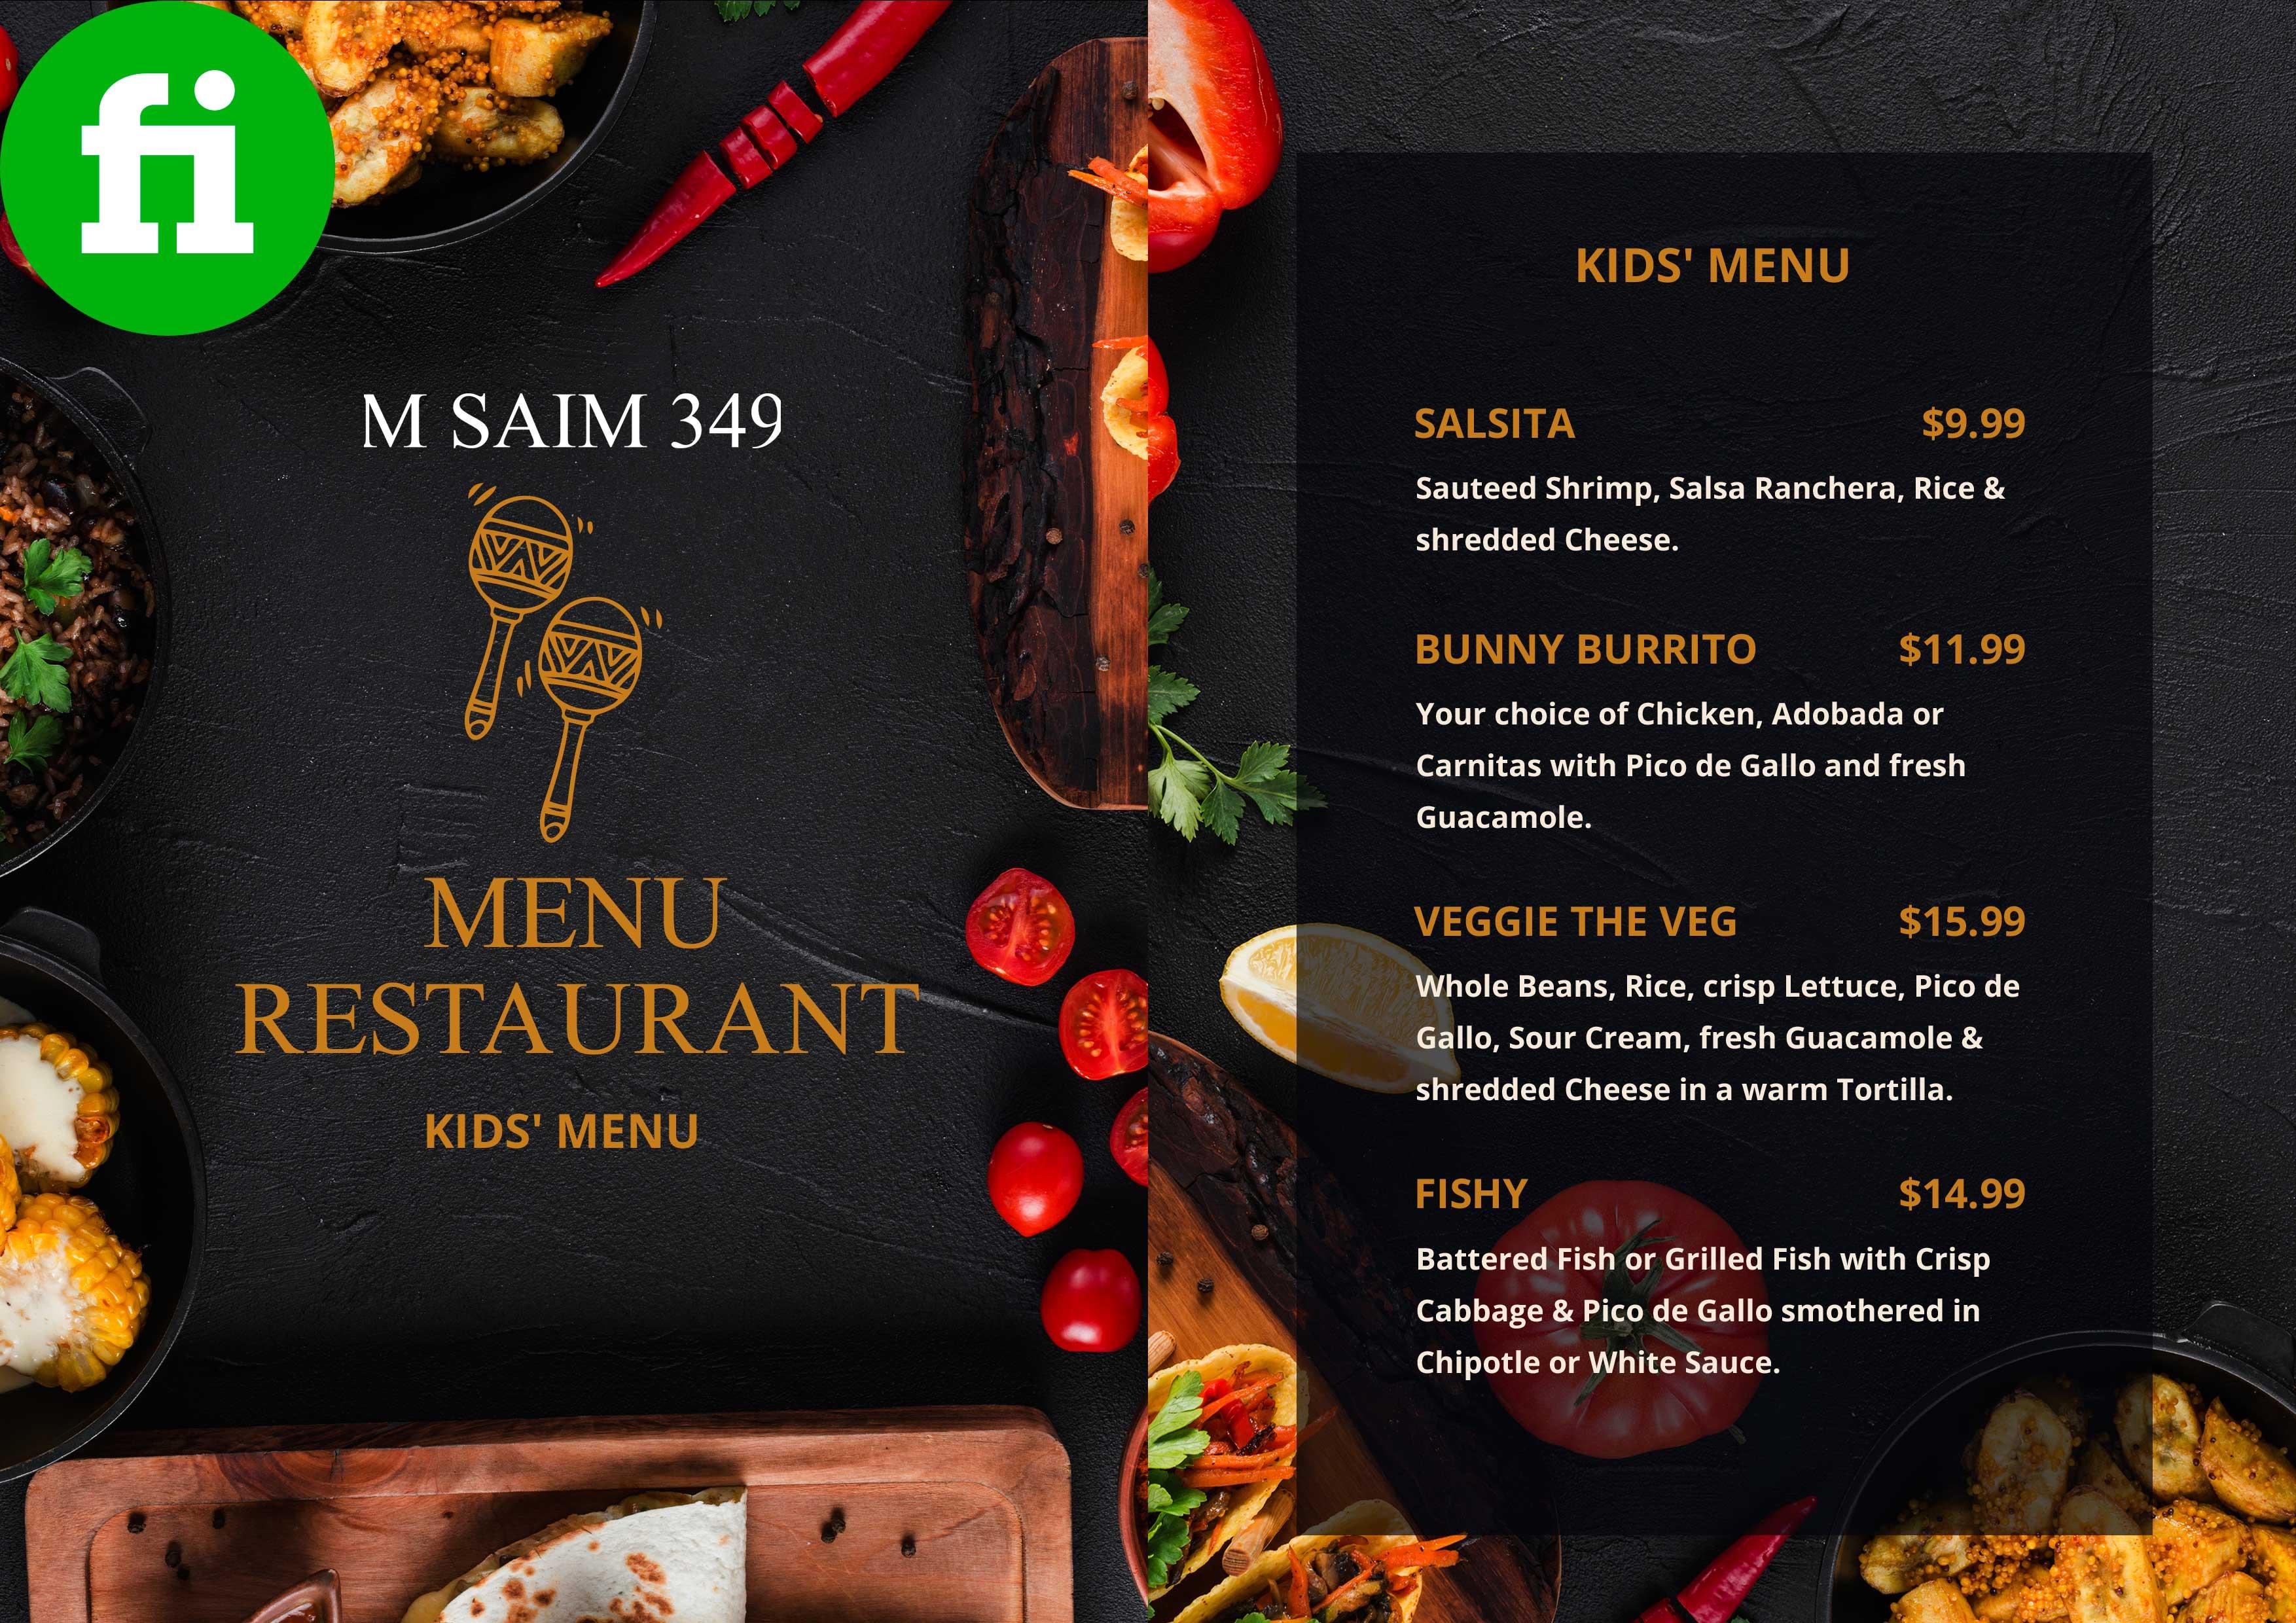 Elegant Restaurant Menu Arranged Size And Style By M Saim349